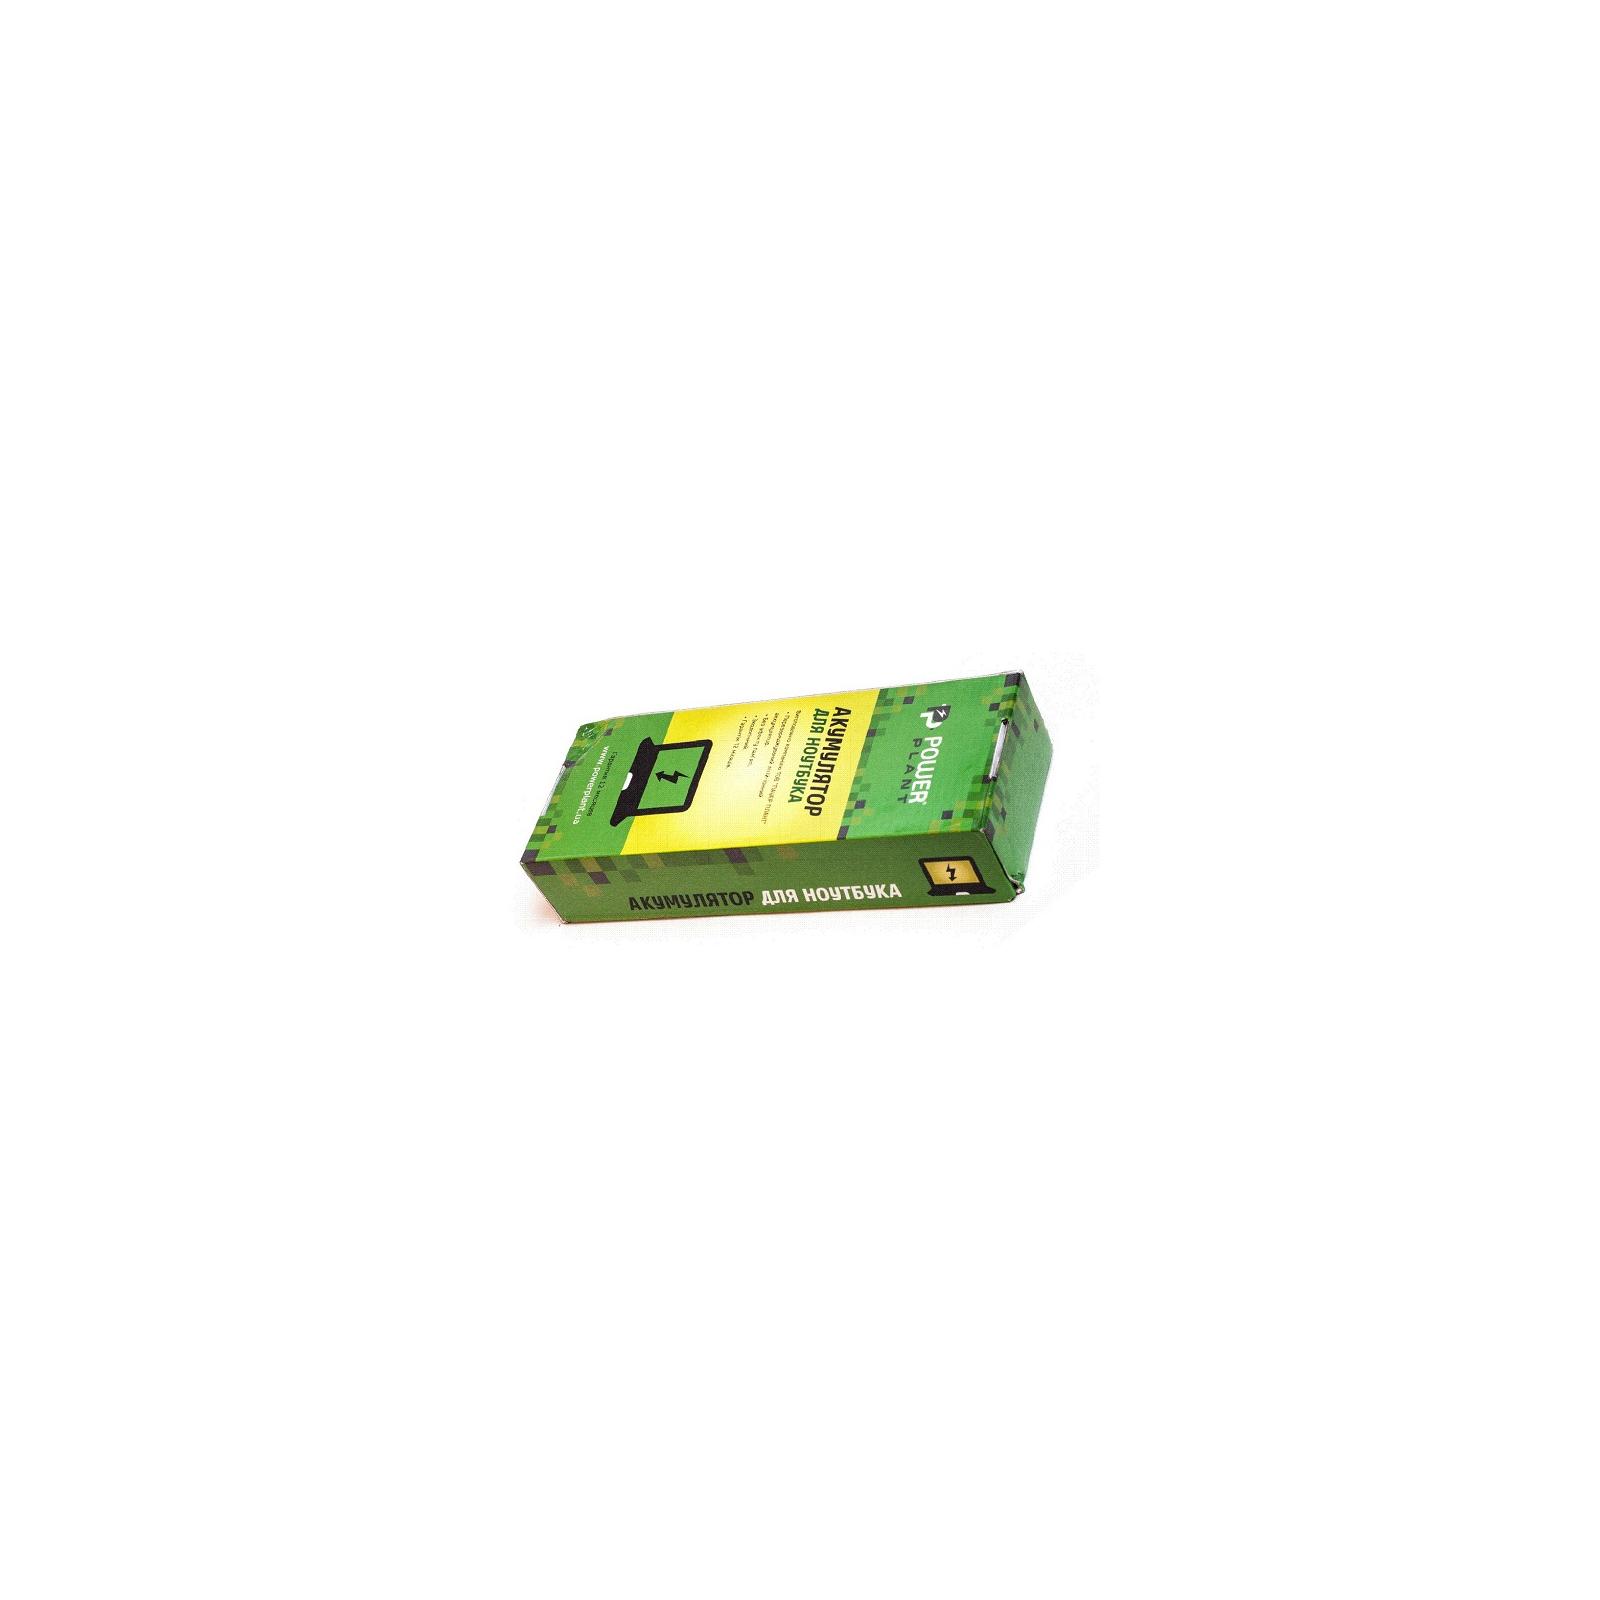 Аккумулятор для ноутбука DELL 1330 (PU556 DE-M1330-6) 11.1V 5200mAh PowerPlant (NB00000176) изображение 3